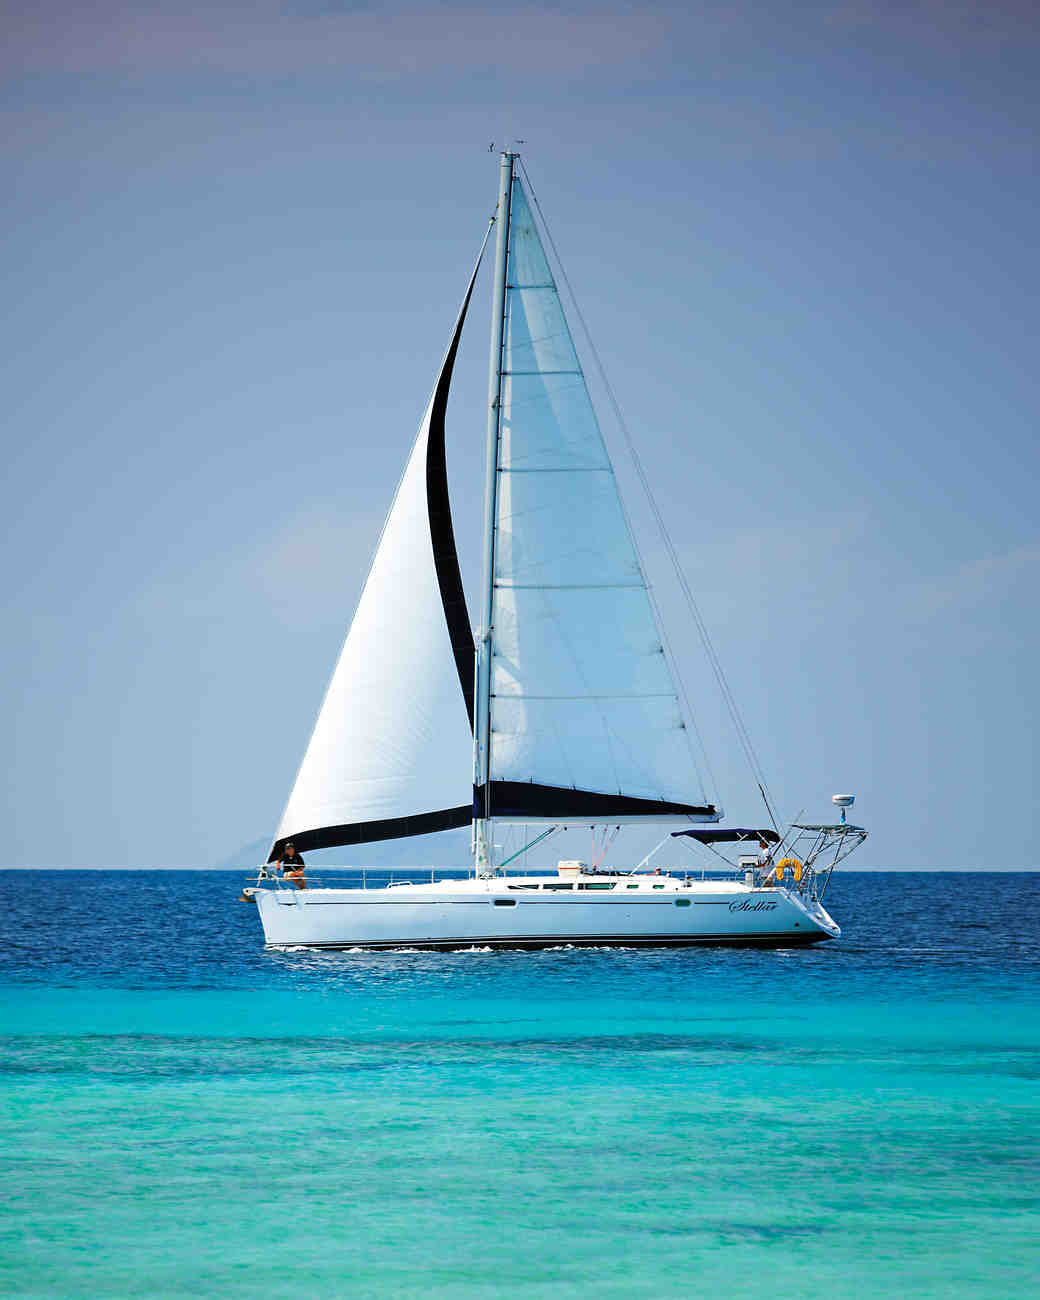 sailing-fiji-safari-mws110053.jpg